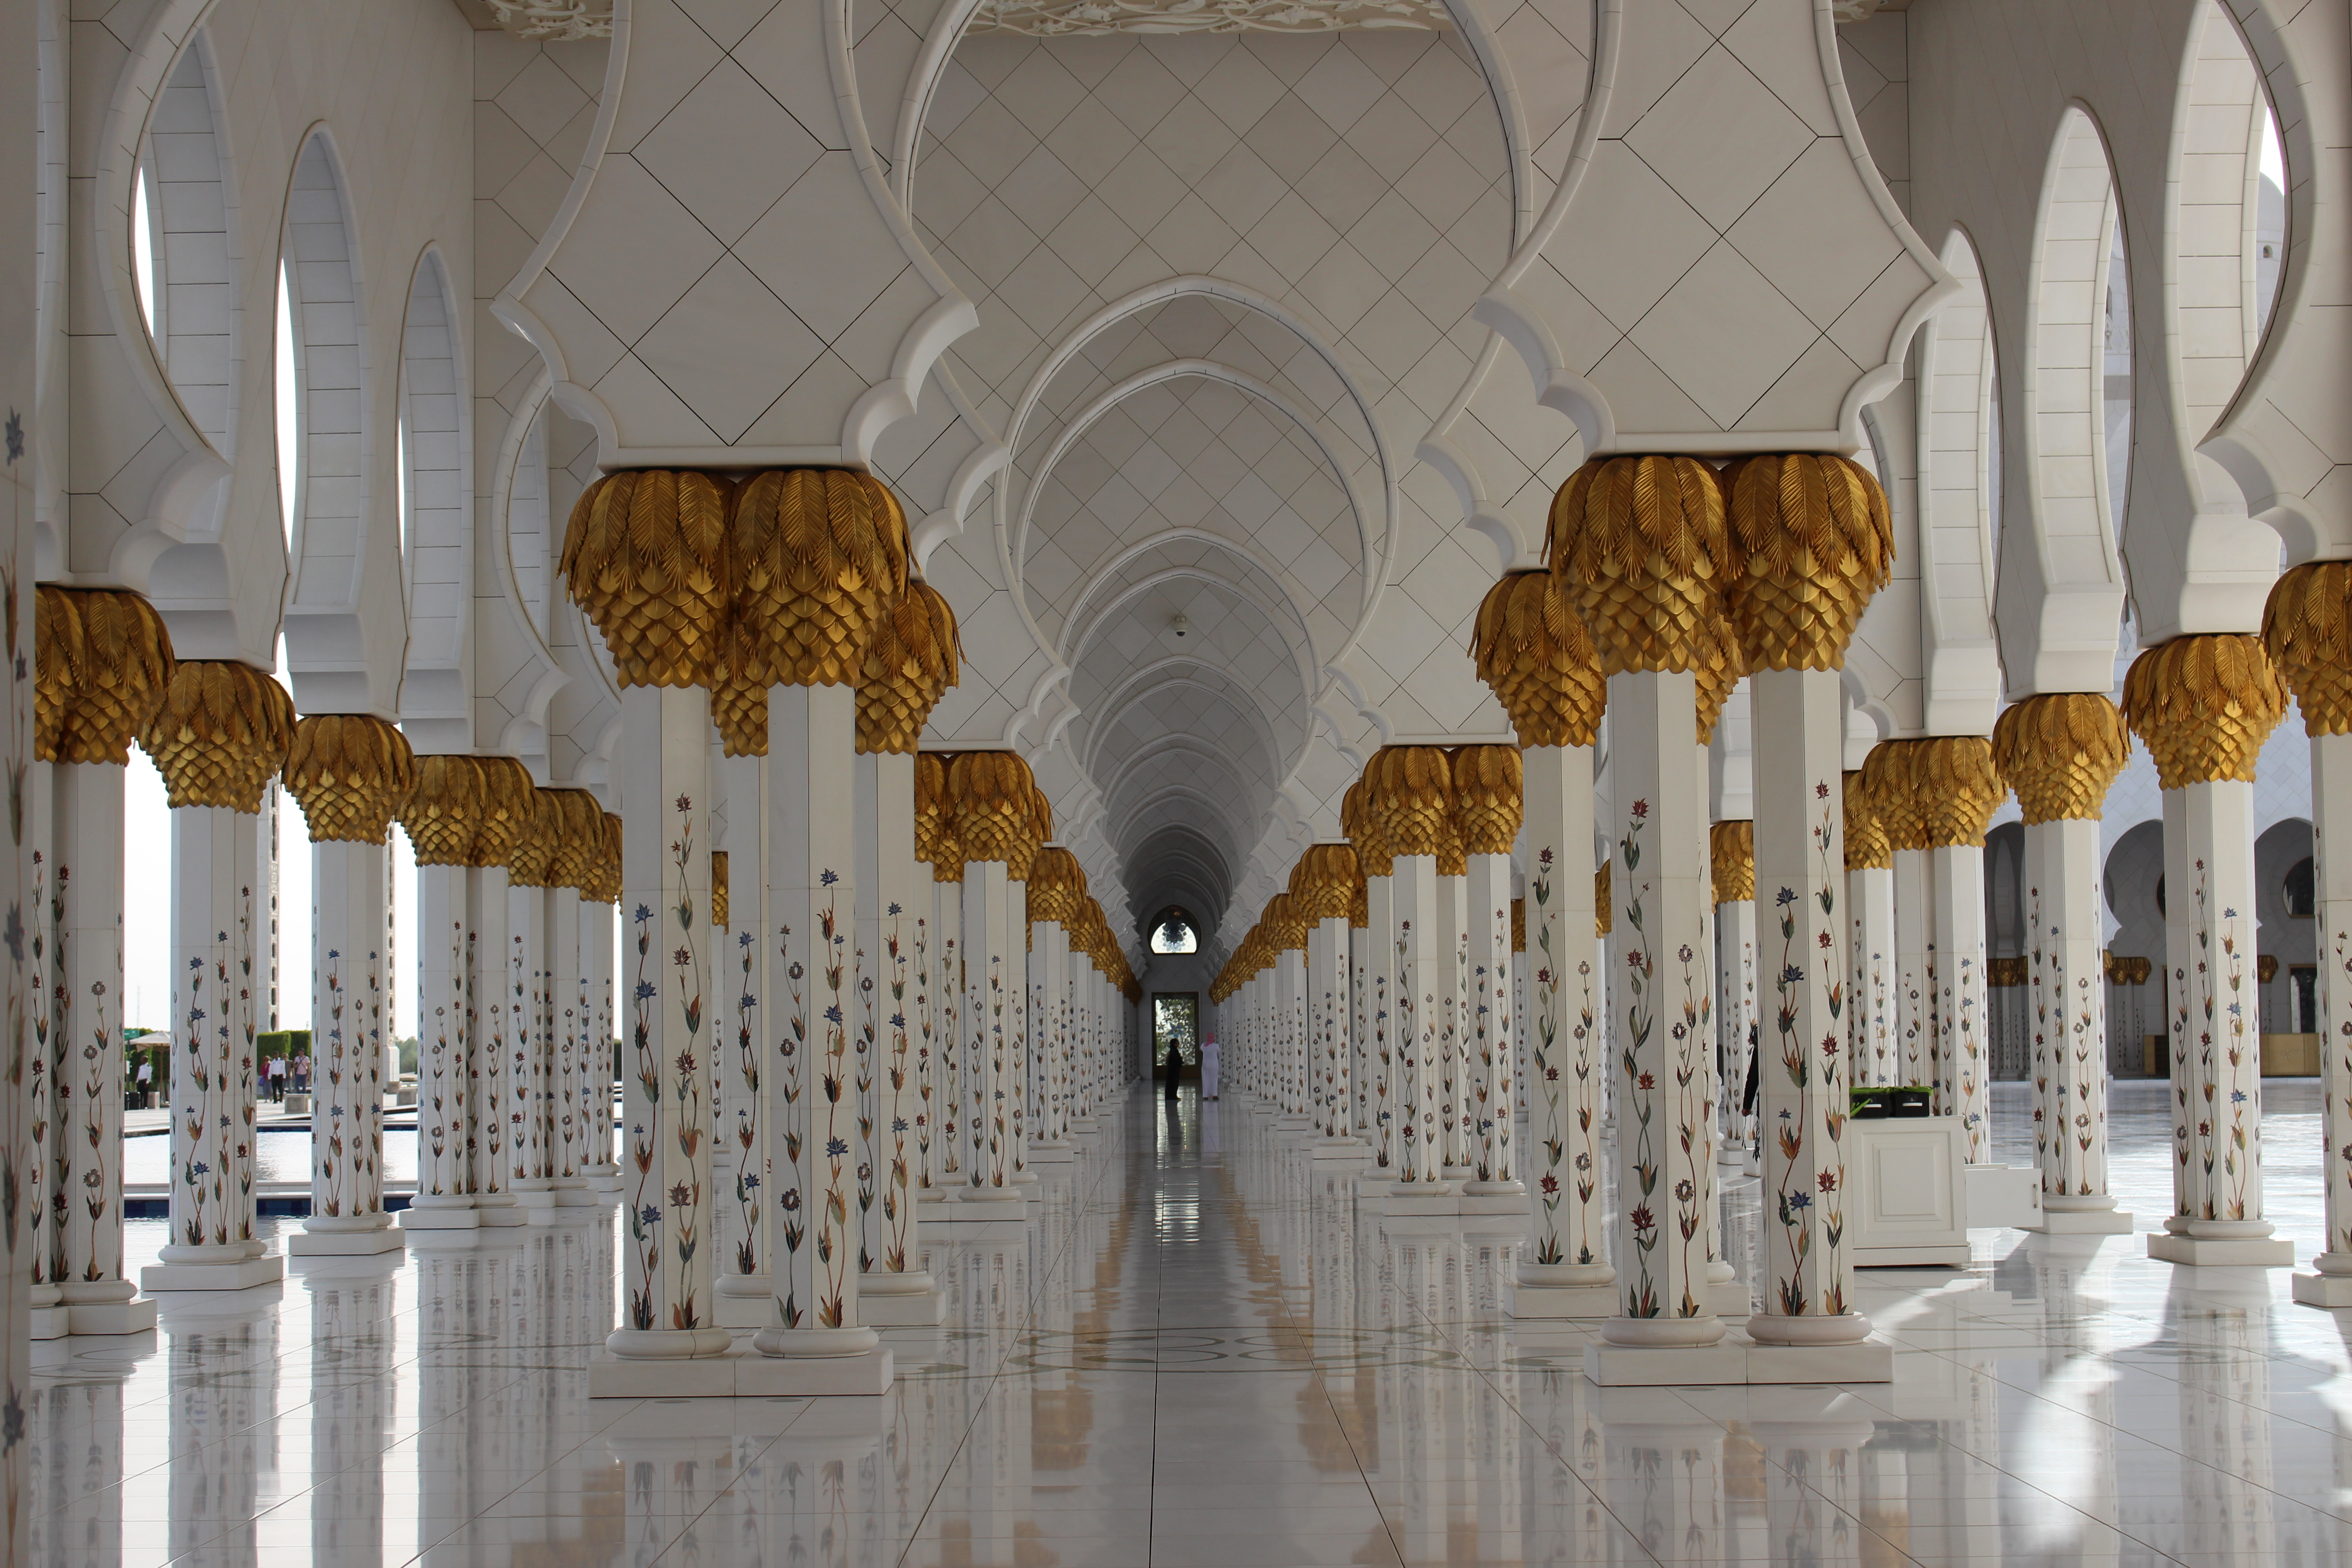 La moschea di sheikh zayed ad abu dhabi for Disegni di interni